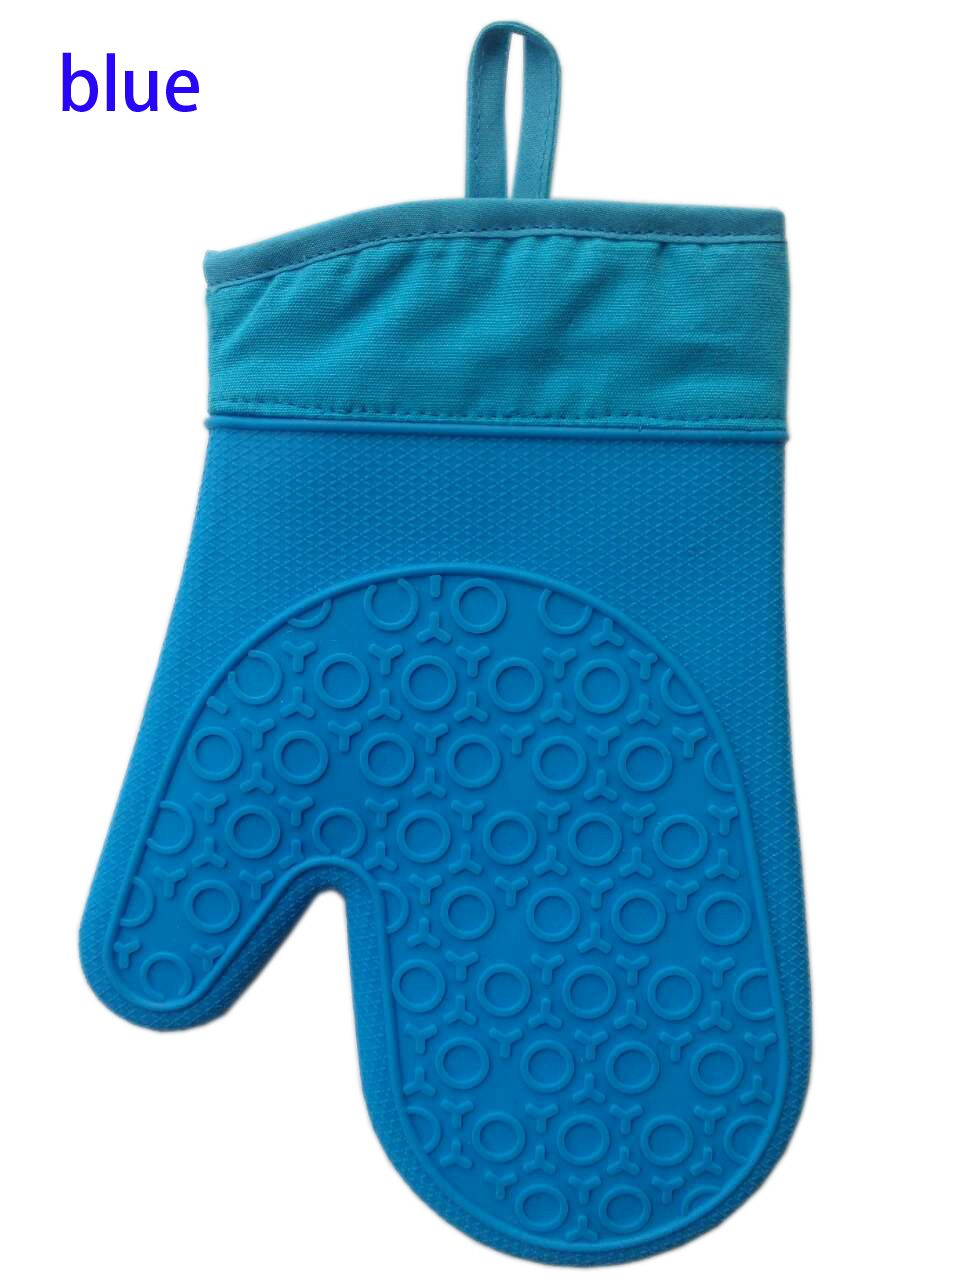 11inch silicone cotton heat resistant anti-slip 100% cotton filling oven mitt oven glove